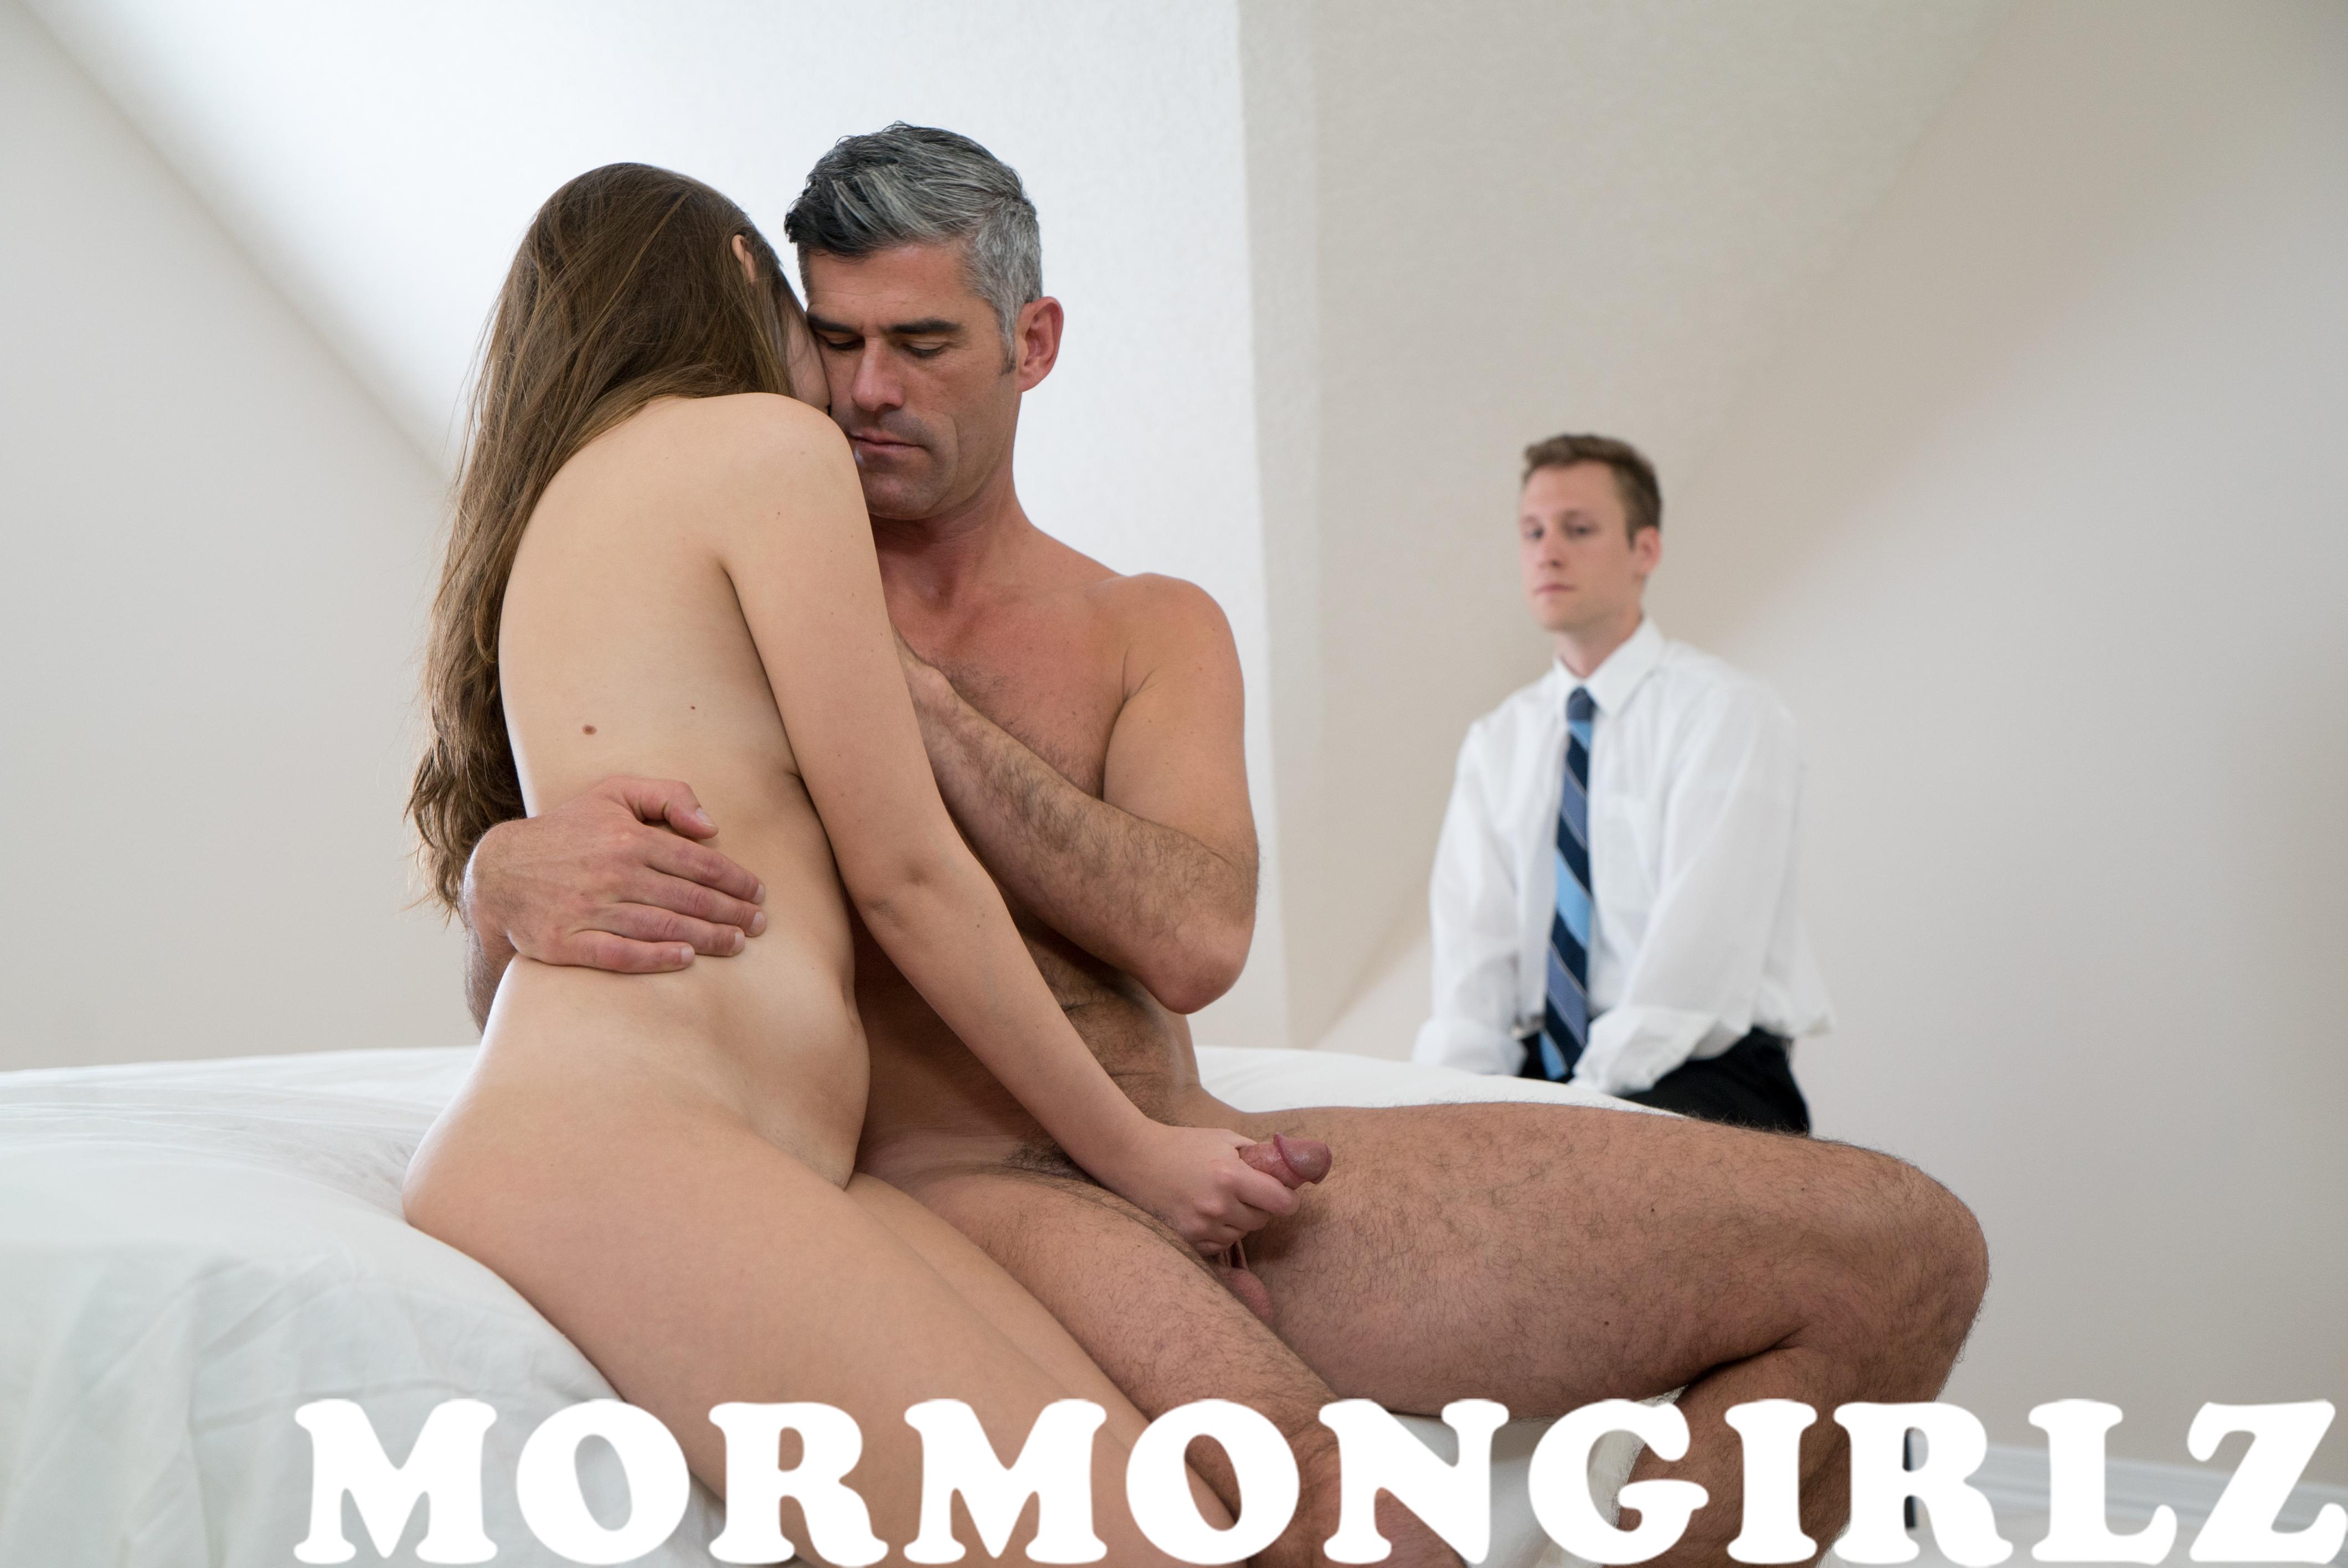 076_mormongirlz_0007